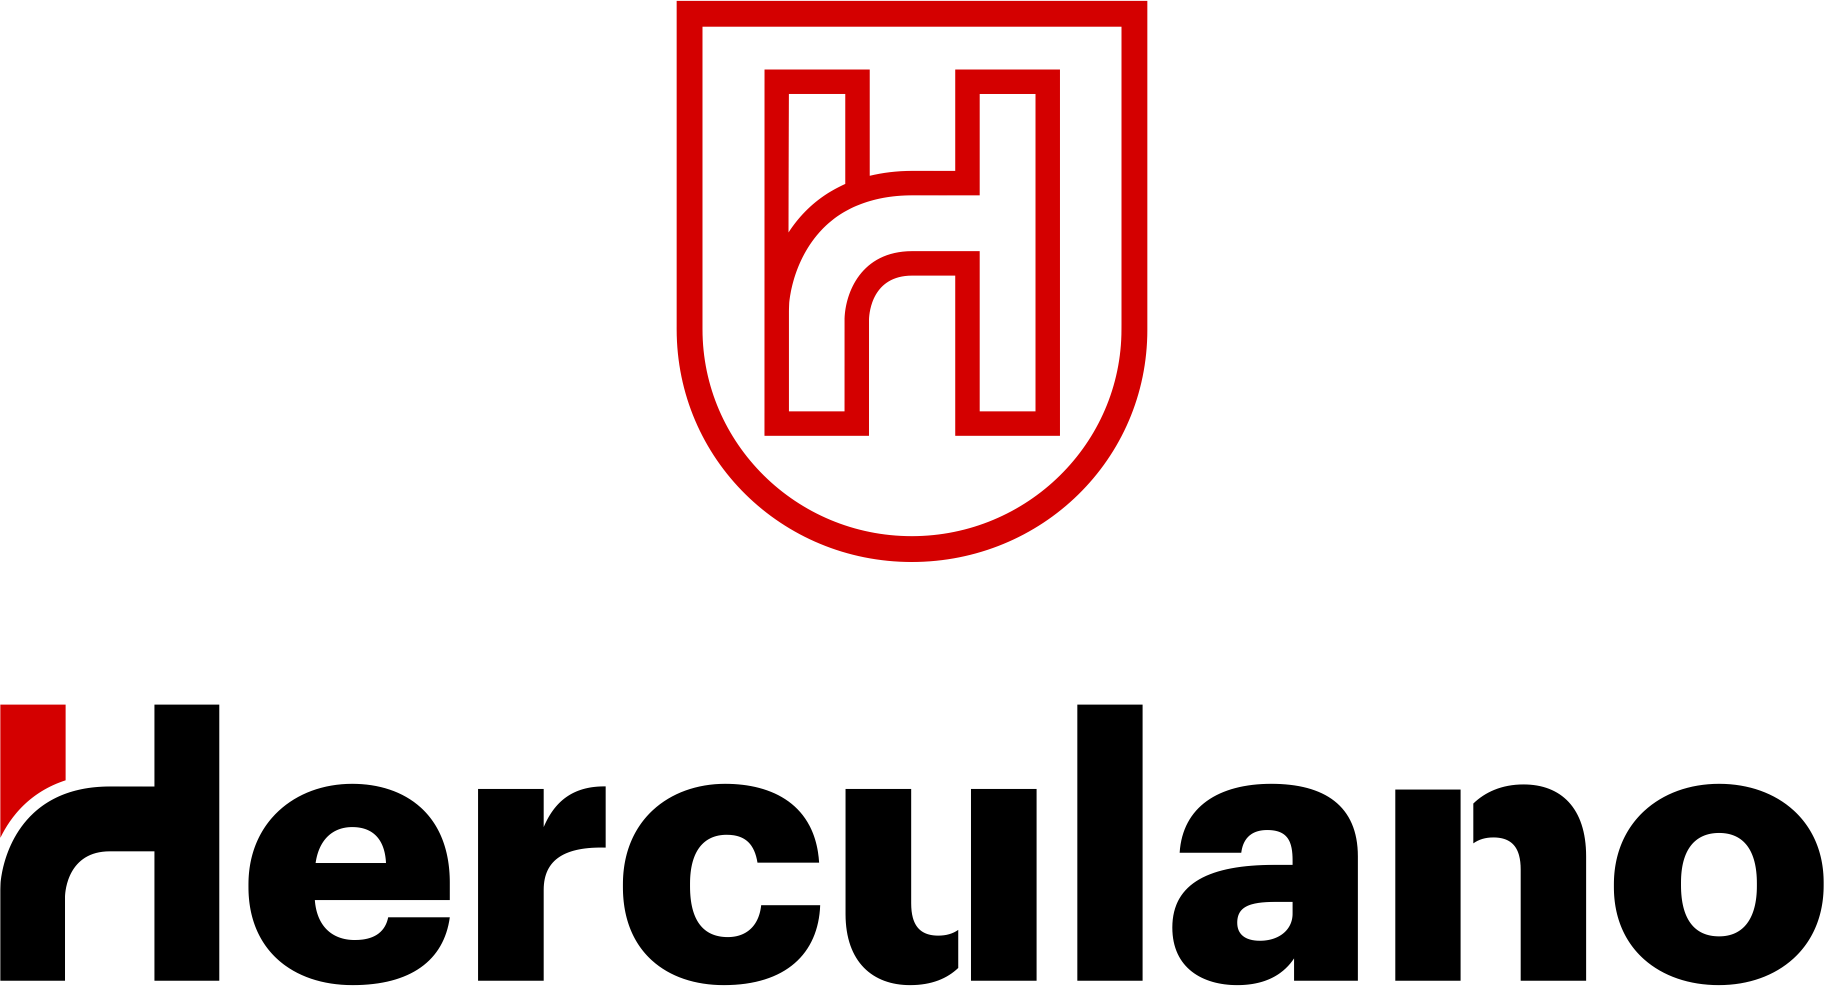 herculano.png